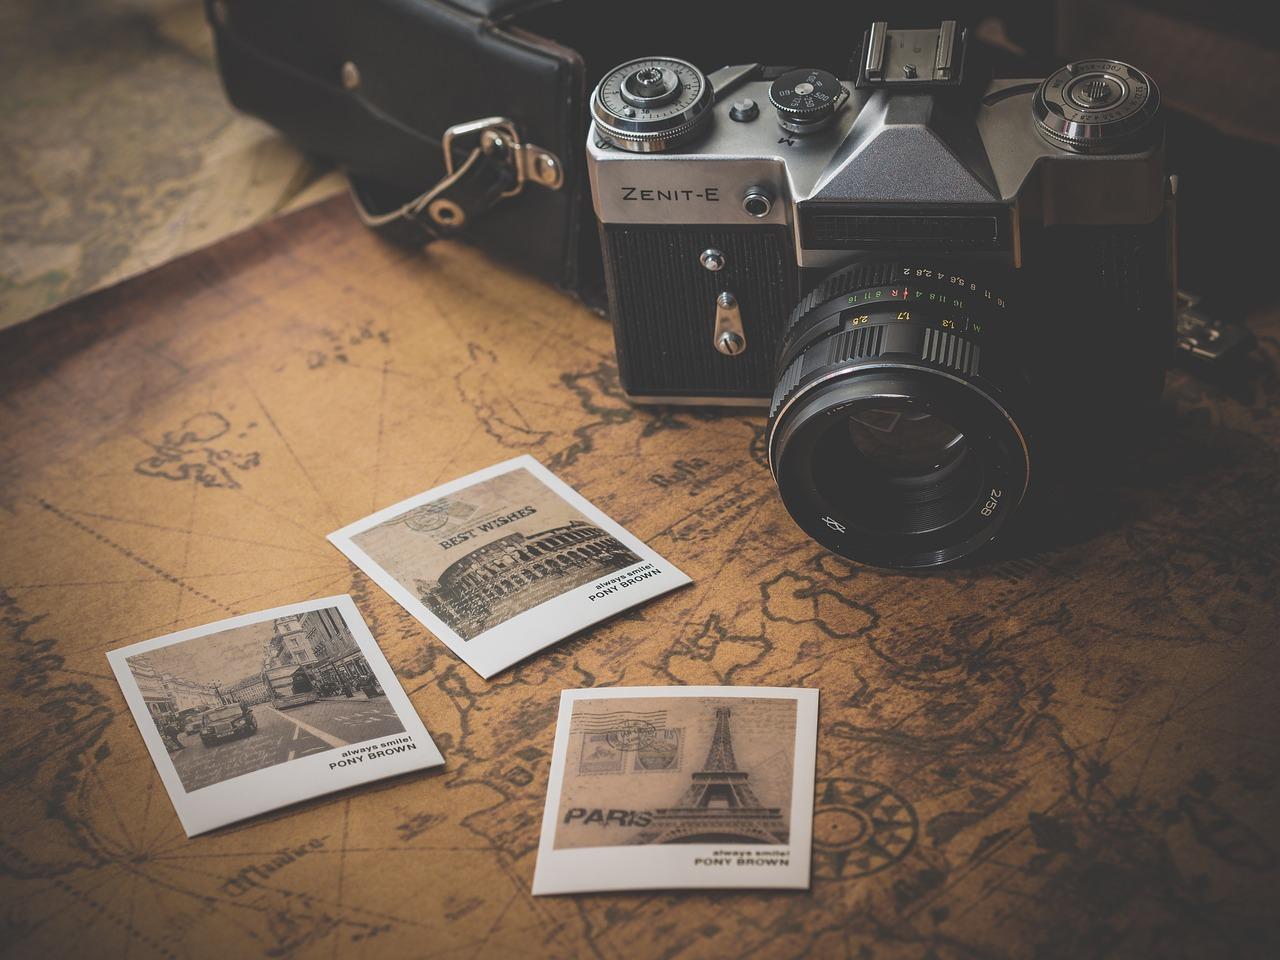 Camera, Printed Photos and Traveling Map